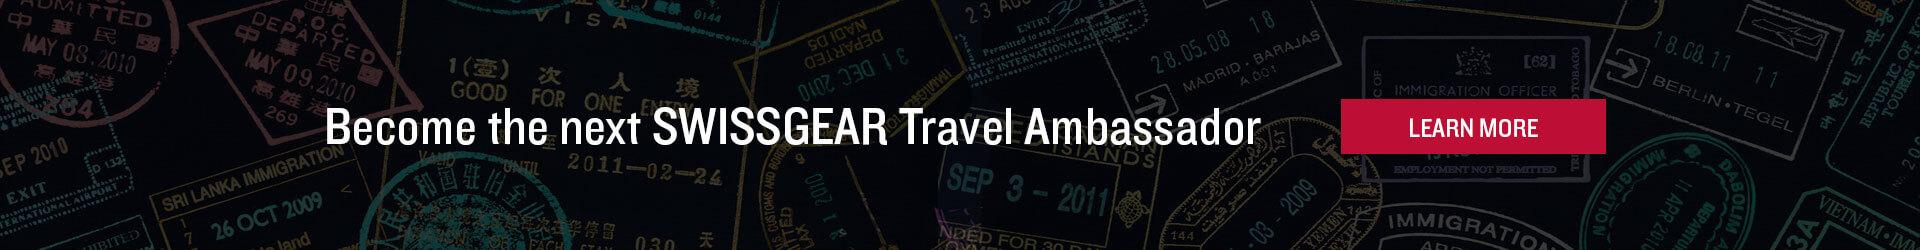 Become the next SWISSGEAR Travel Ambassador - click here